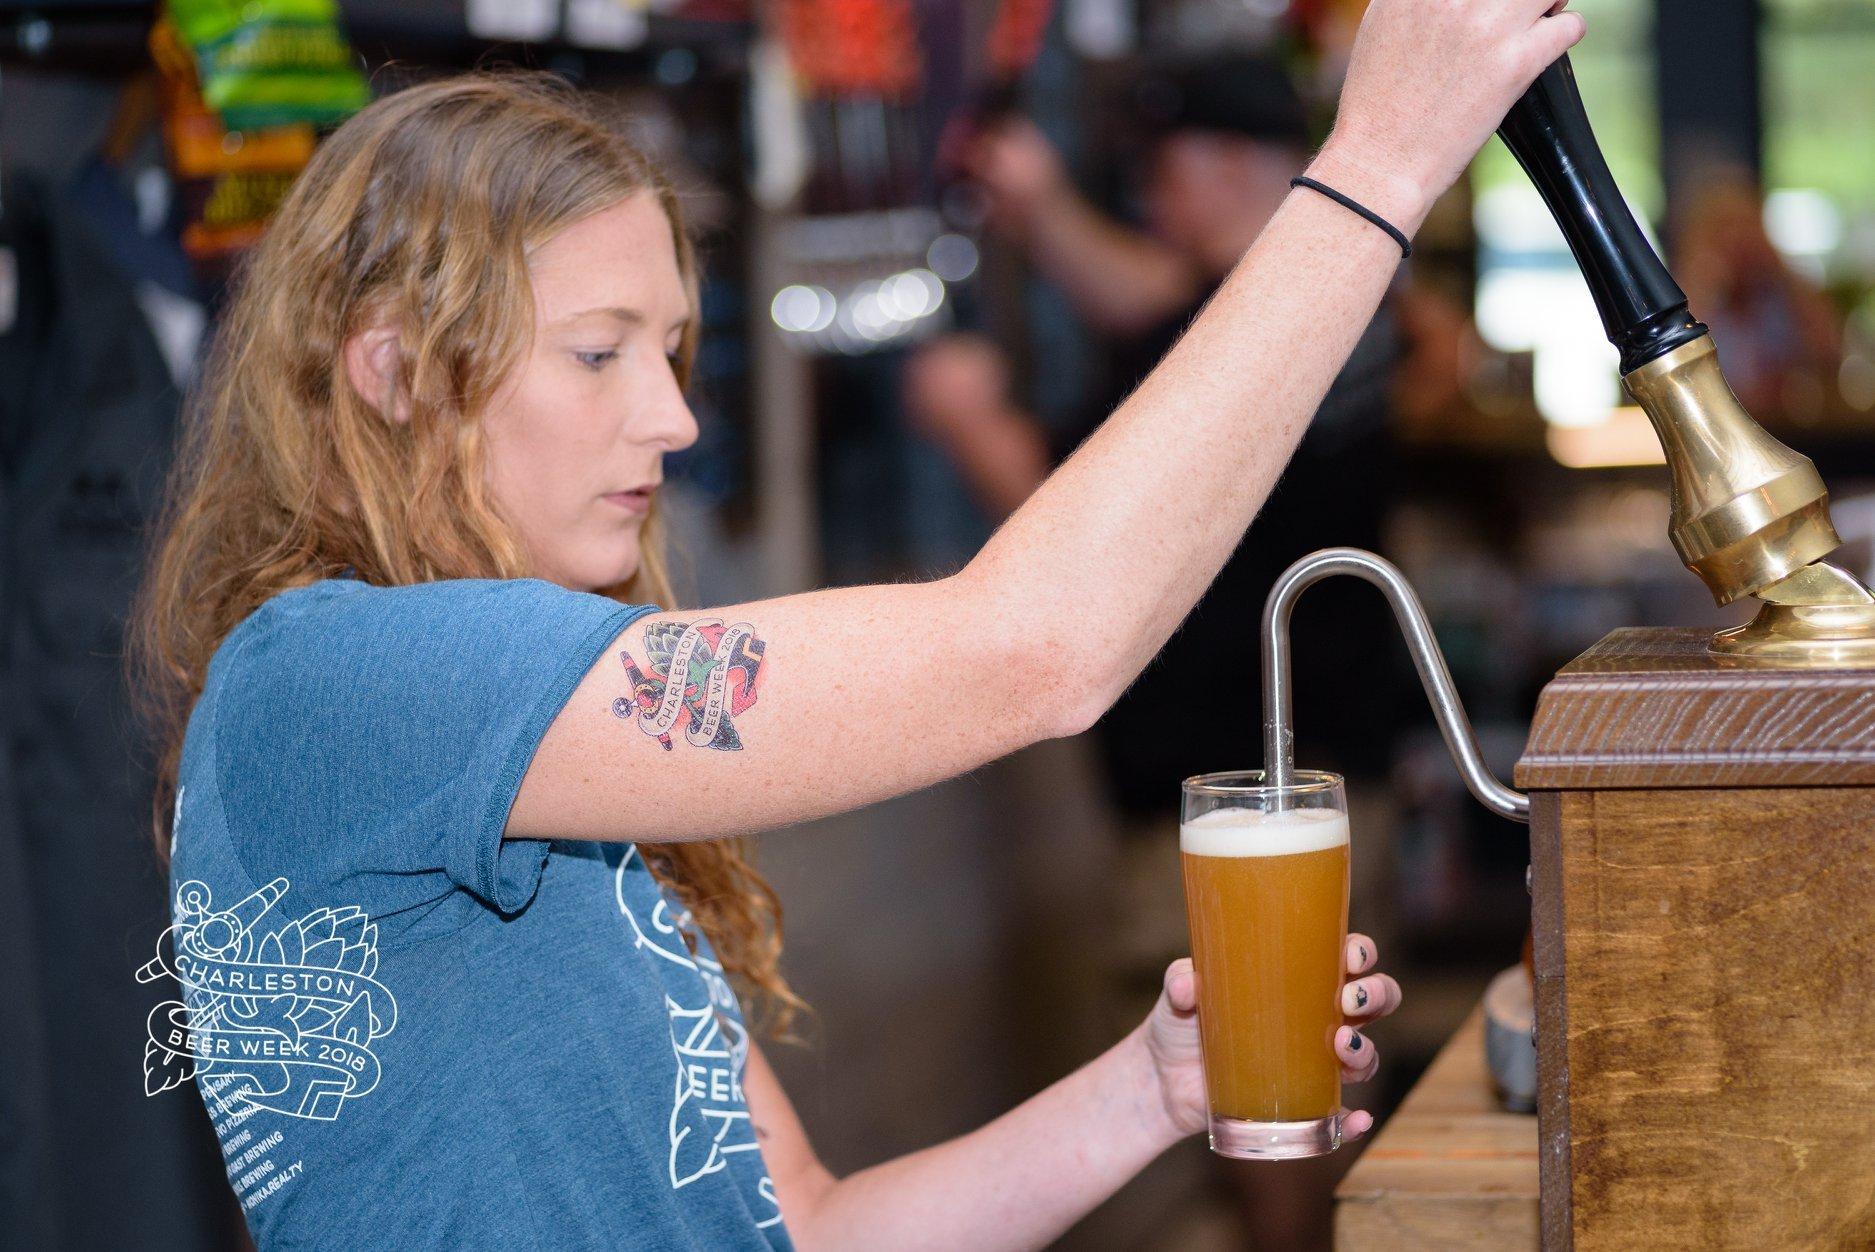 Beer pour at the 2018 Charleston Beer Week Fest